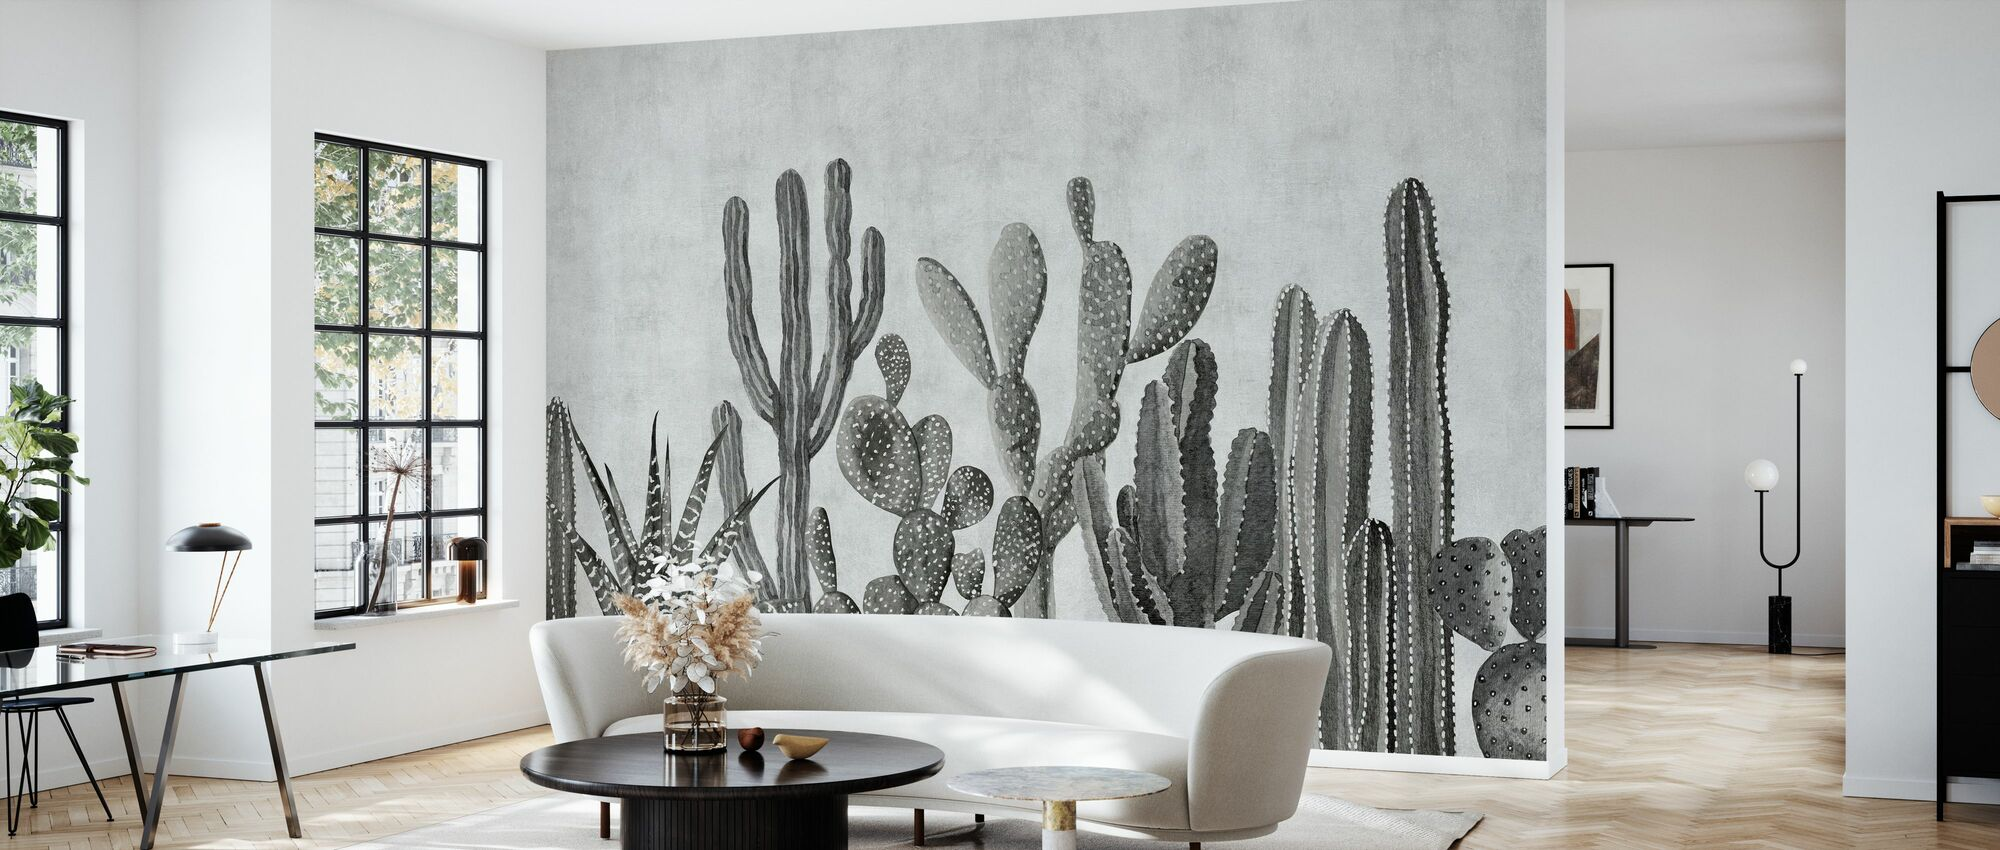 Atacama Cactus - Bw - Wallpaper - Living Room